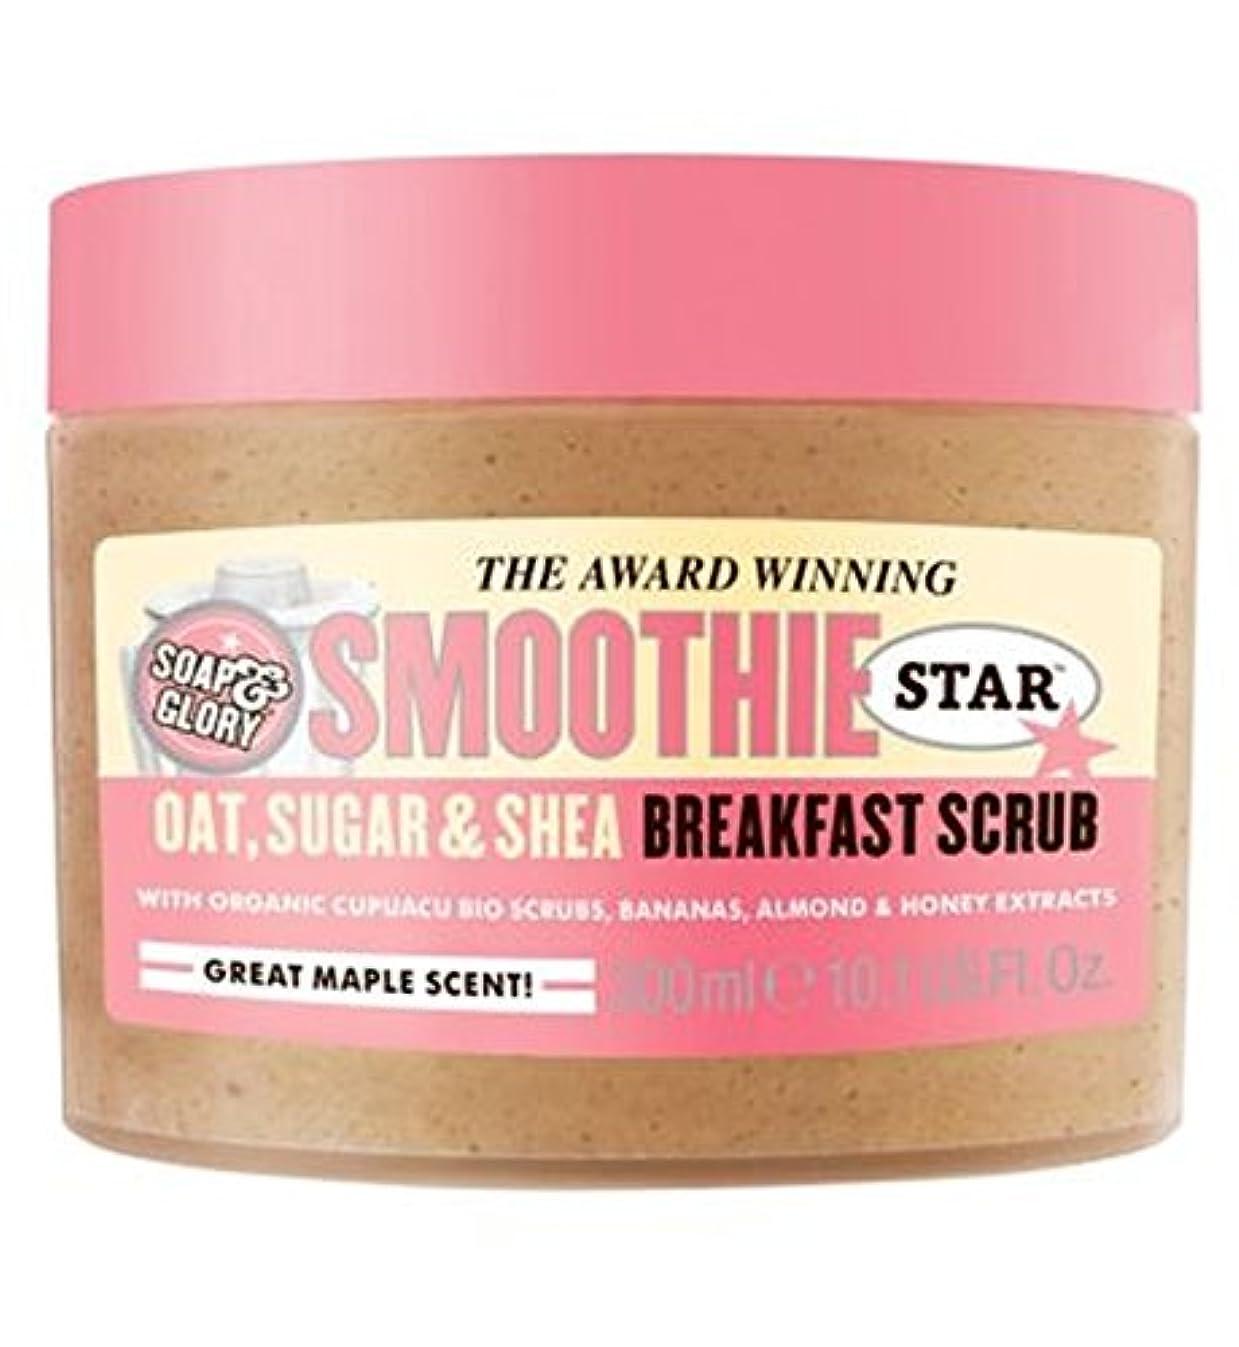 Soap & Glory Smoothie Star Breakfast Scrub 300ml - 石鹸&栄光スムージースター朝食スクラブ300ミリリットル (Soap & Glory) [並行輸入品]